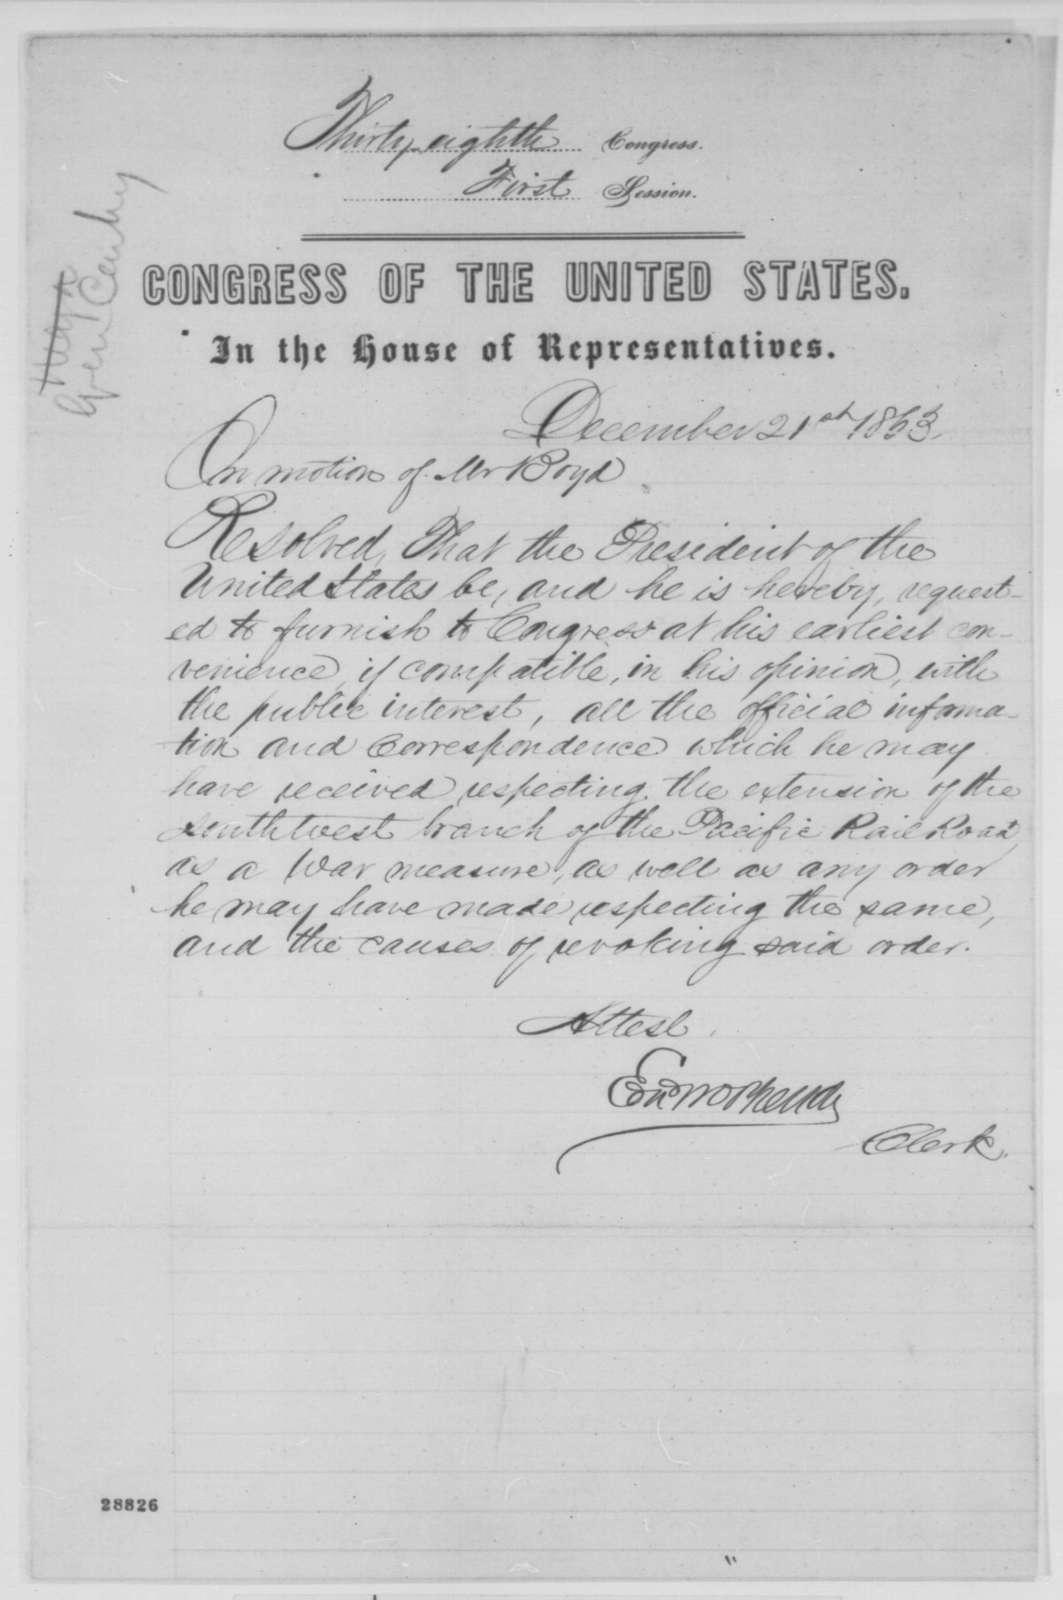 House of Representatives, Monday, December 21, 1863  (Resolution; endorsed by John G. Nicolay, et al.)